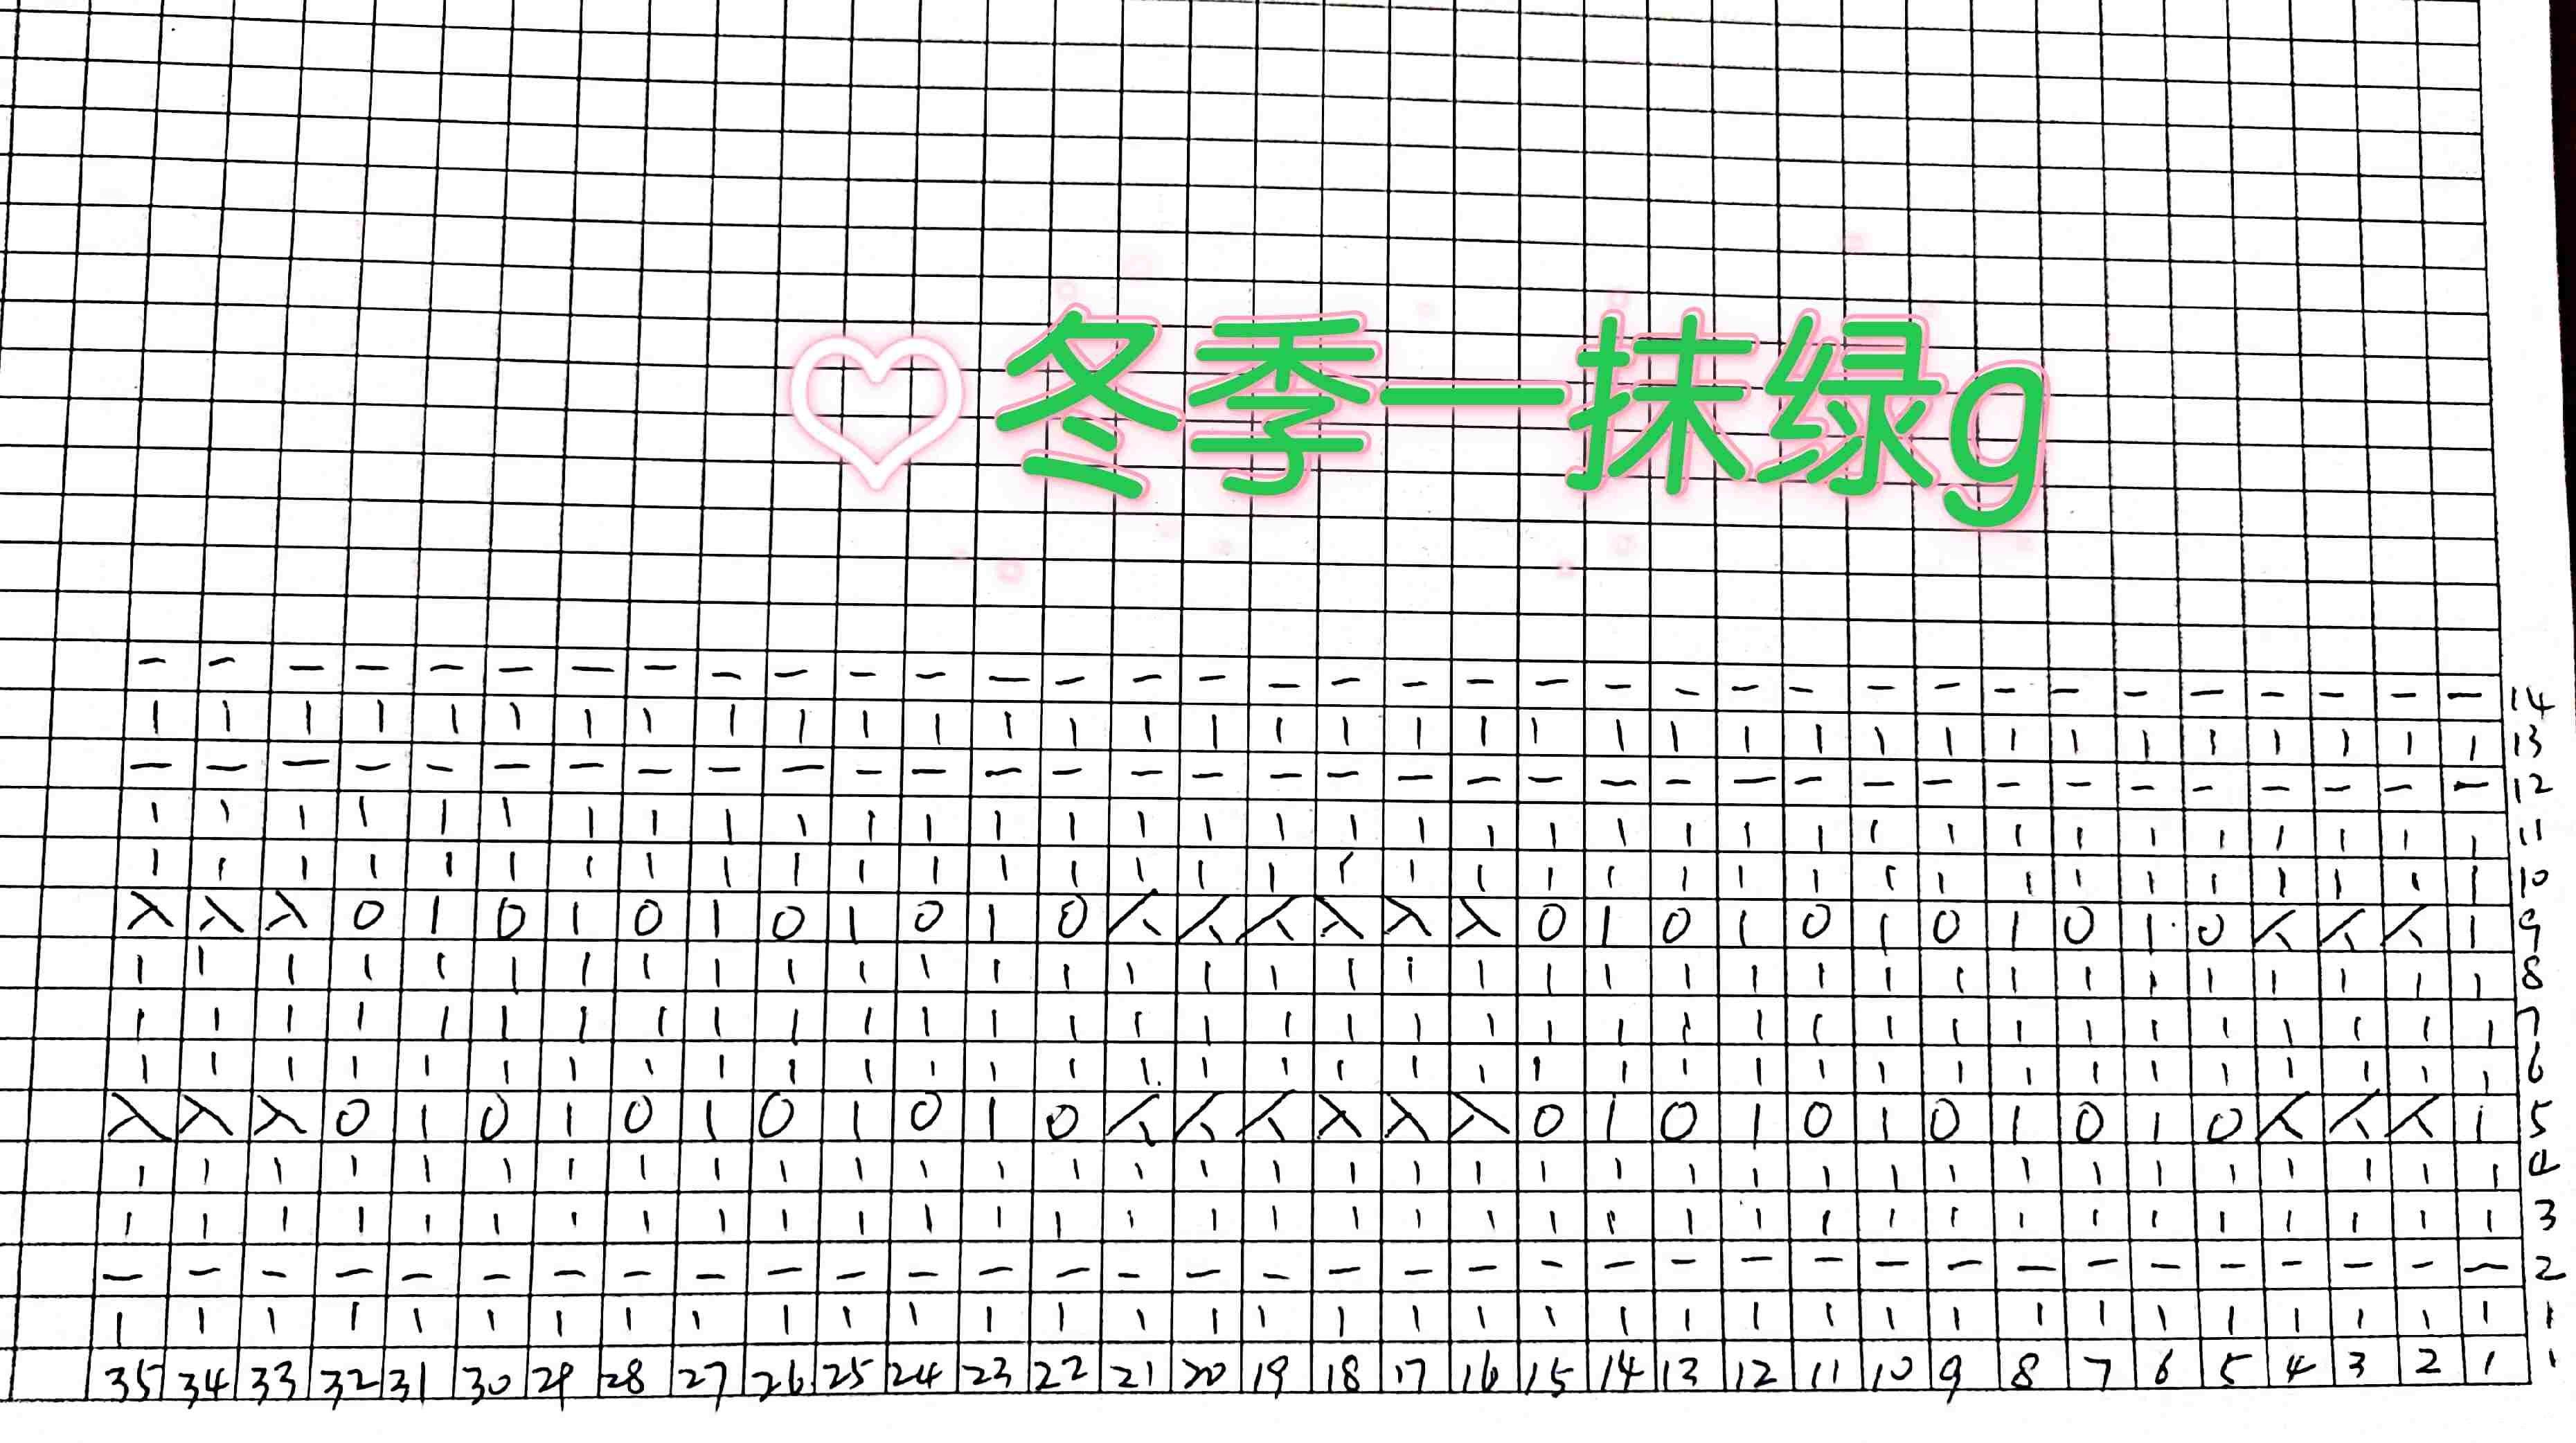 扫描全能王CamScanner 2021-03-28 17.37_1_mh161692433507.jpg